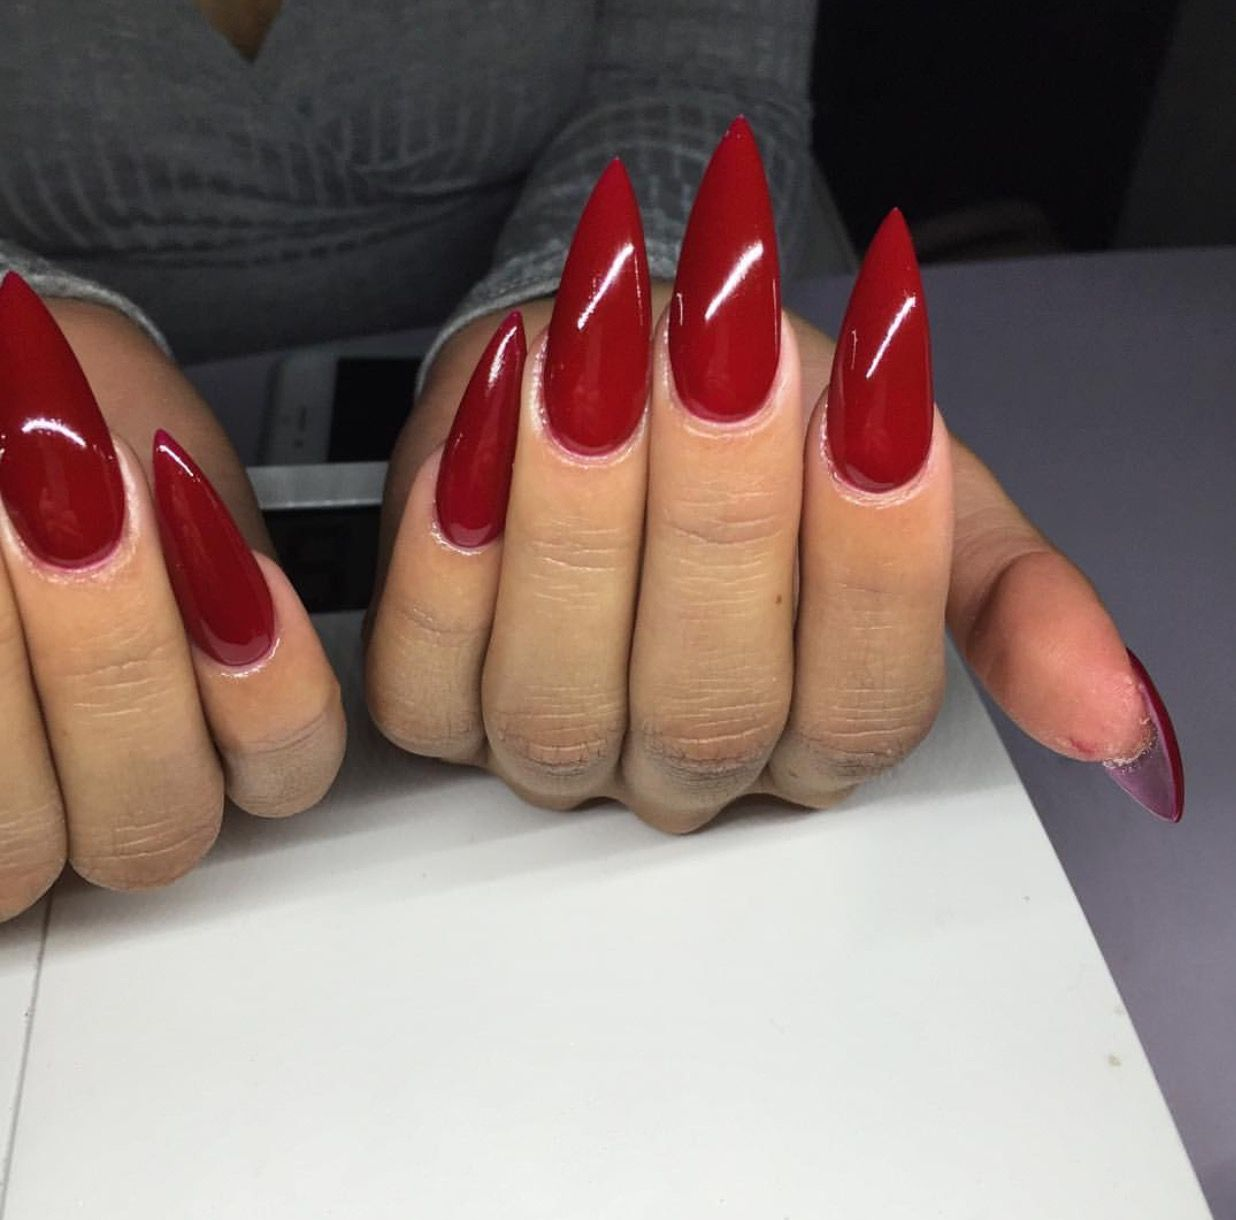 Red stiletto nails nails pinterest arte uñas uñas perfectas y